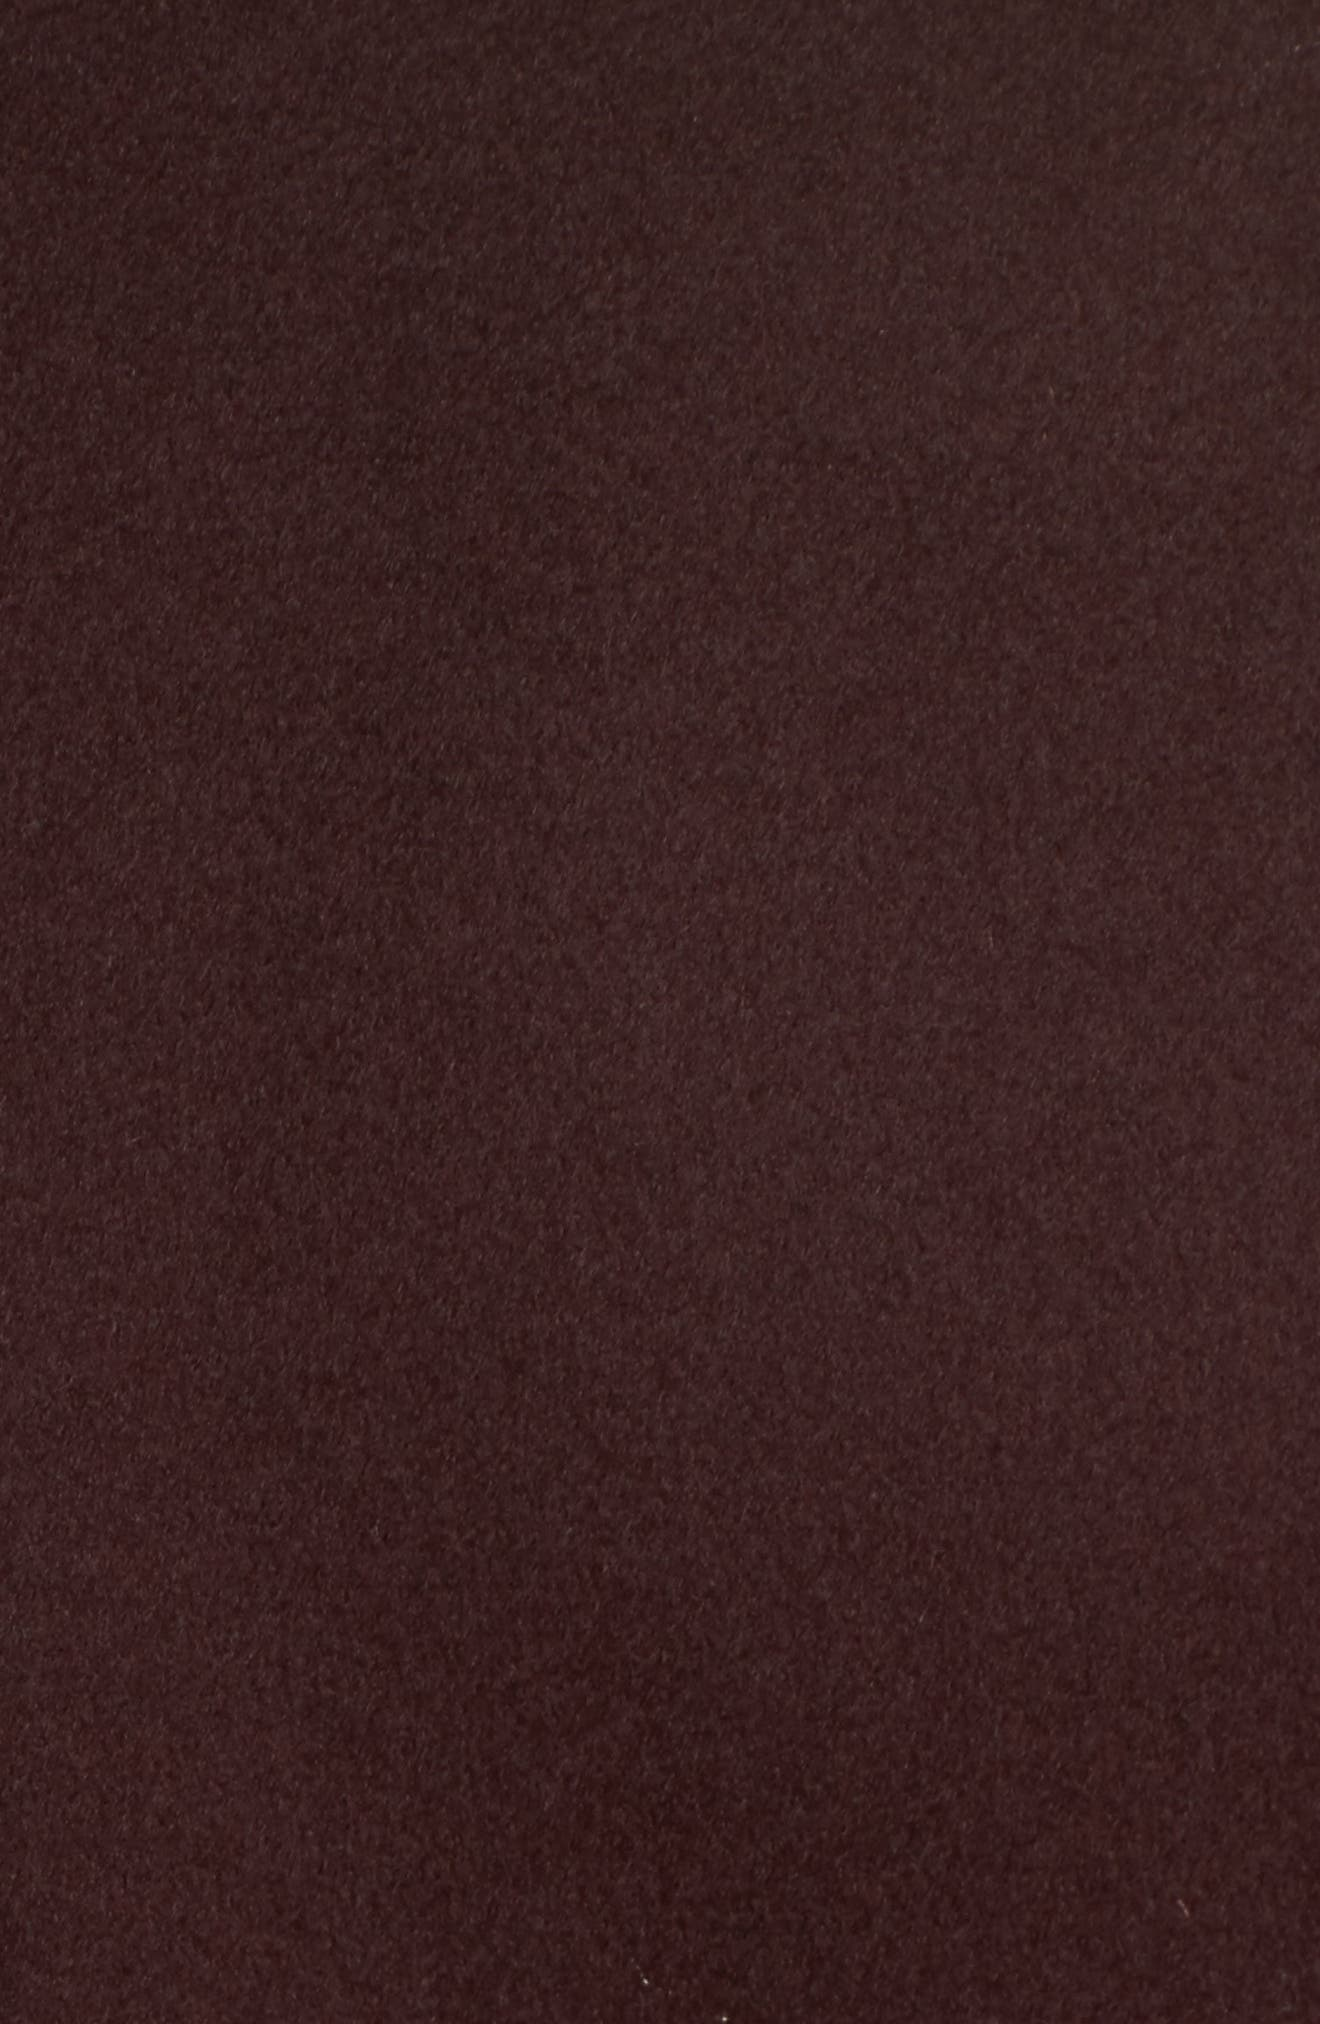 Luna Wool Blend Wrap Coat,                             Alternate thumbnail 6, color,                             Wine